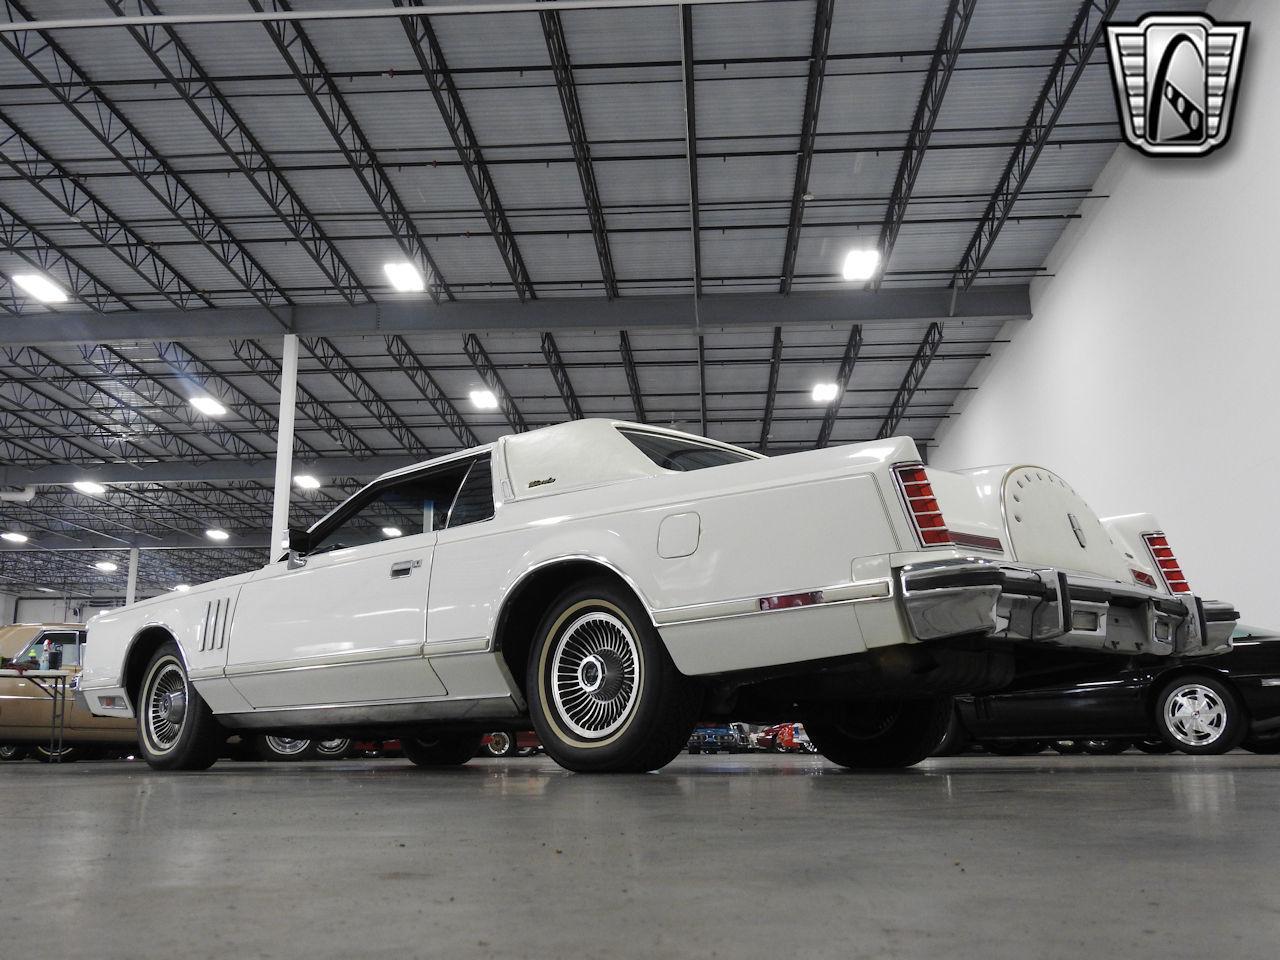 1979 Lincoln MKV 30